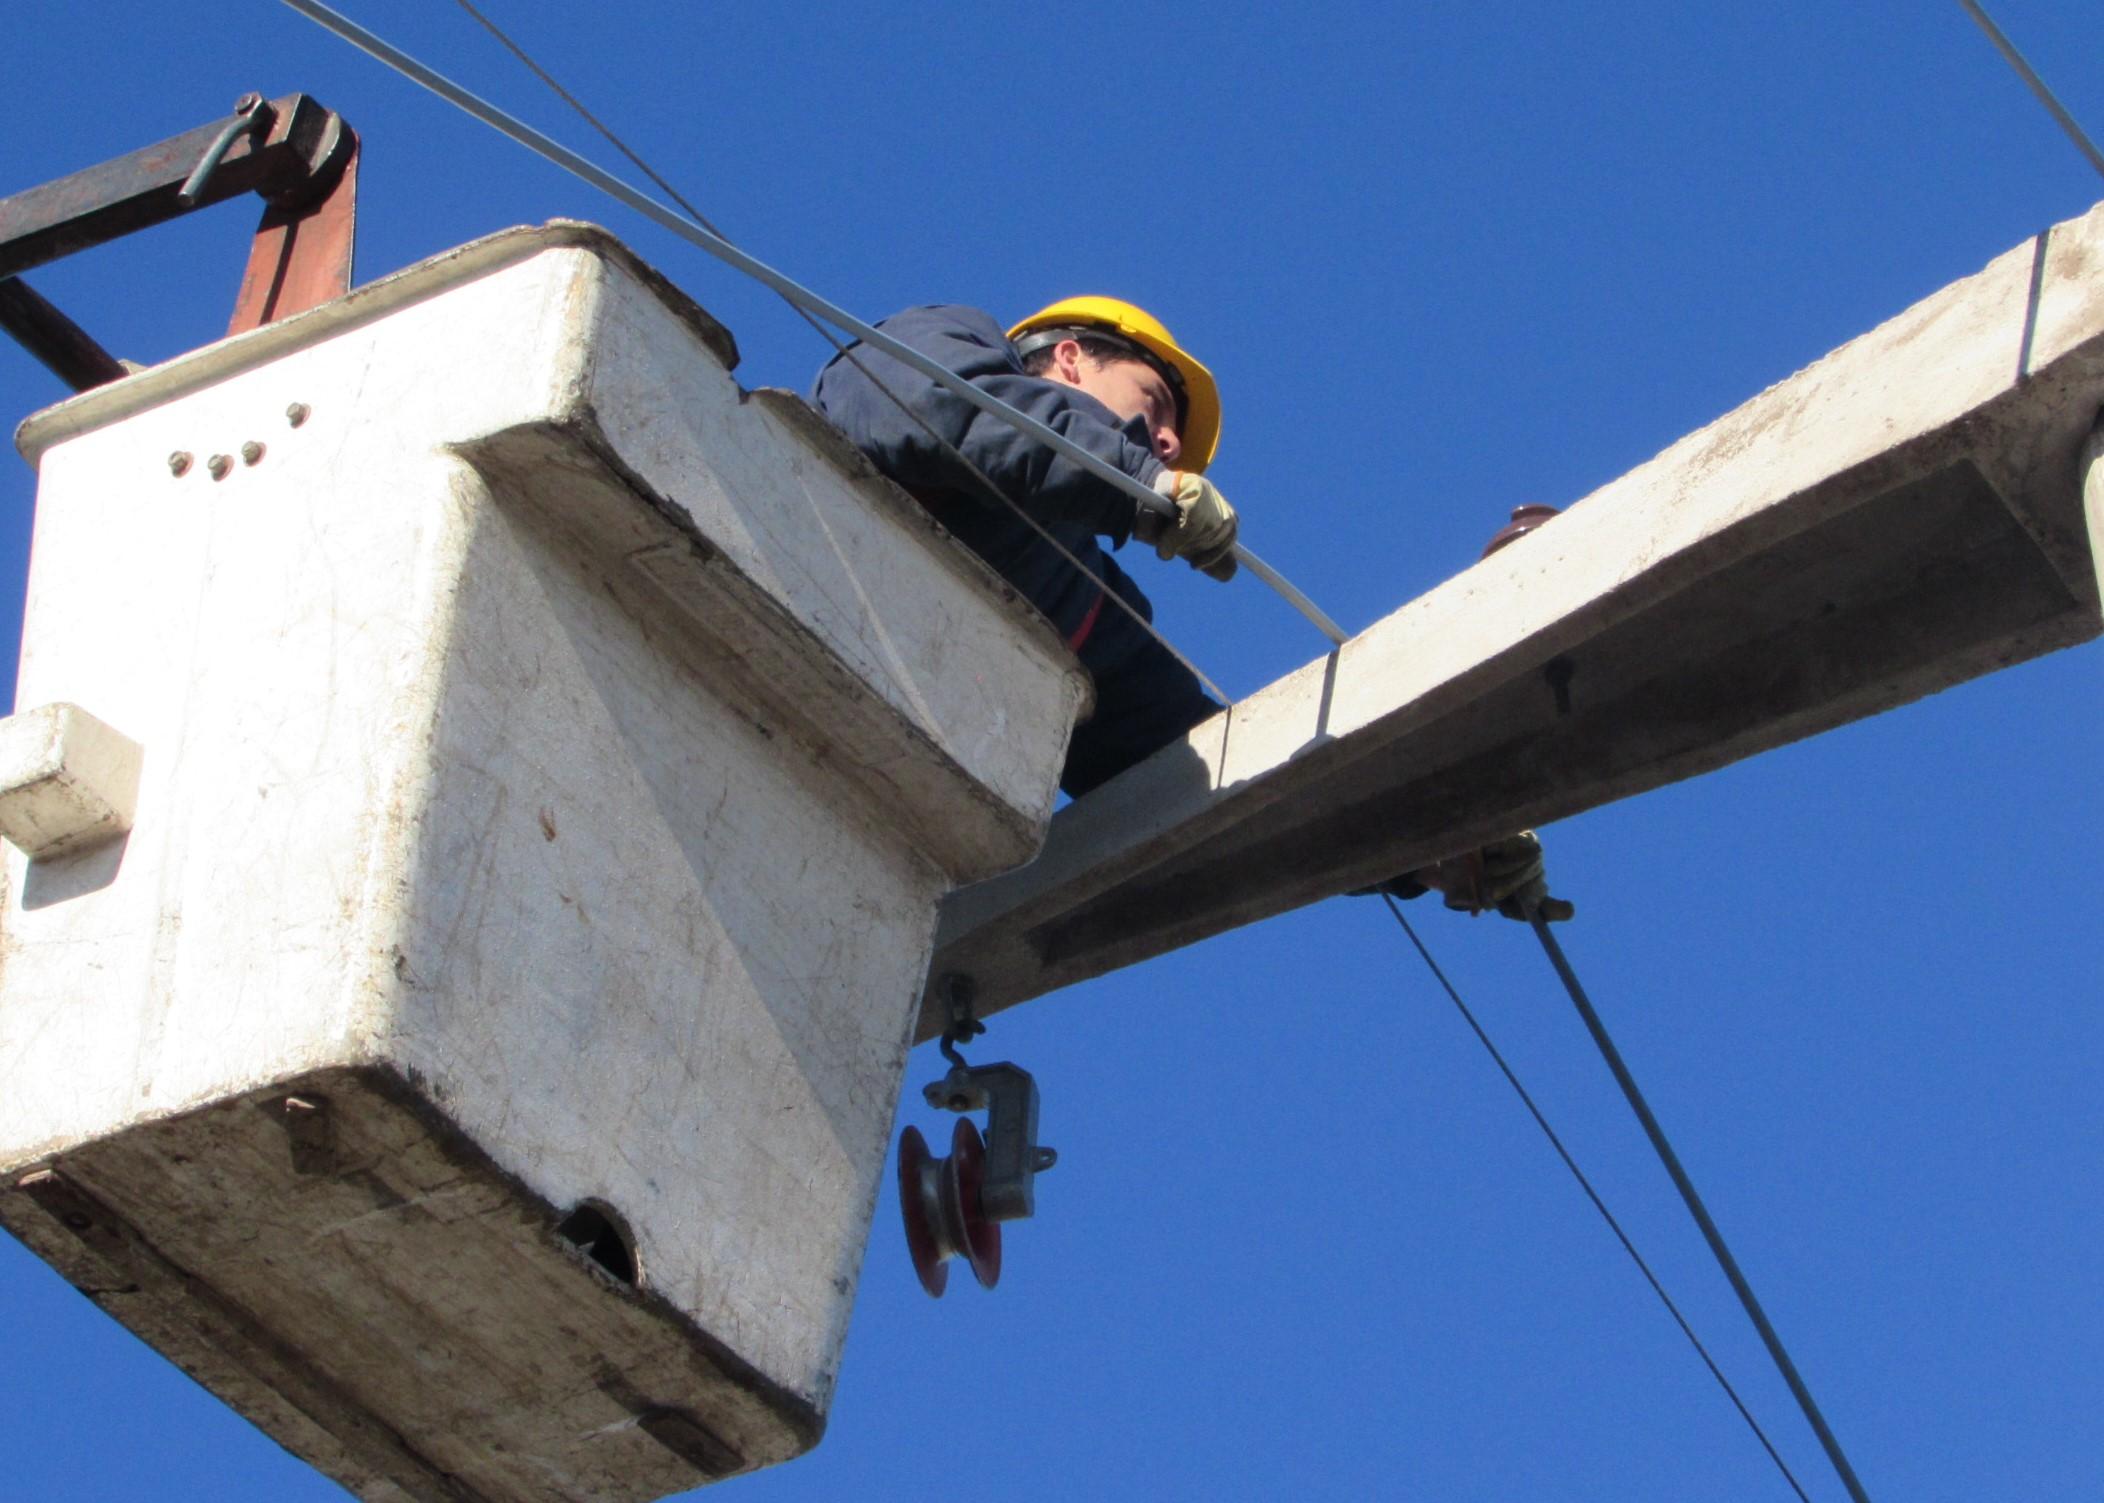 Corpico anuncia corte de Energía que abarca parte del centro piquense y barrio Pacífico